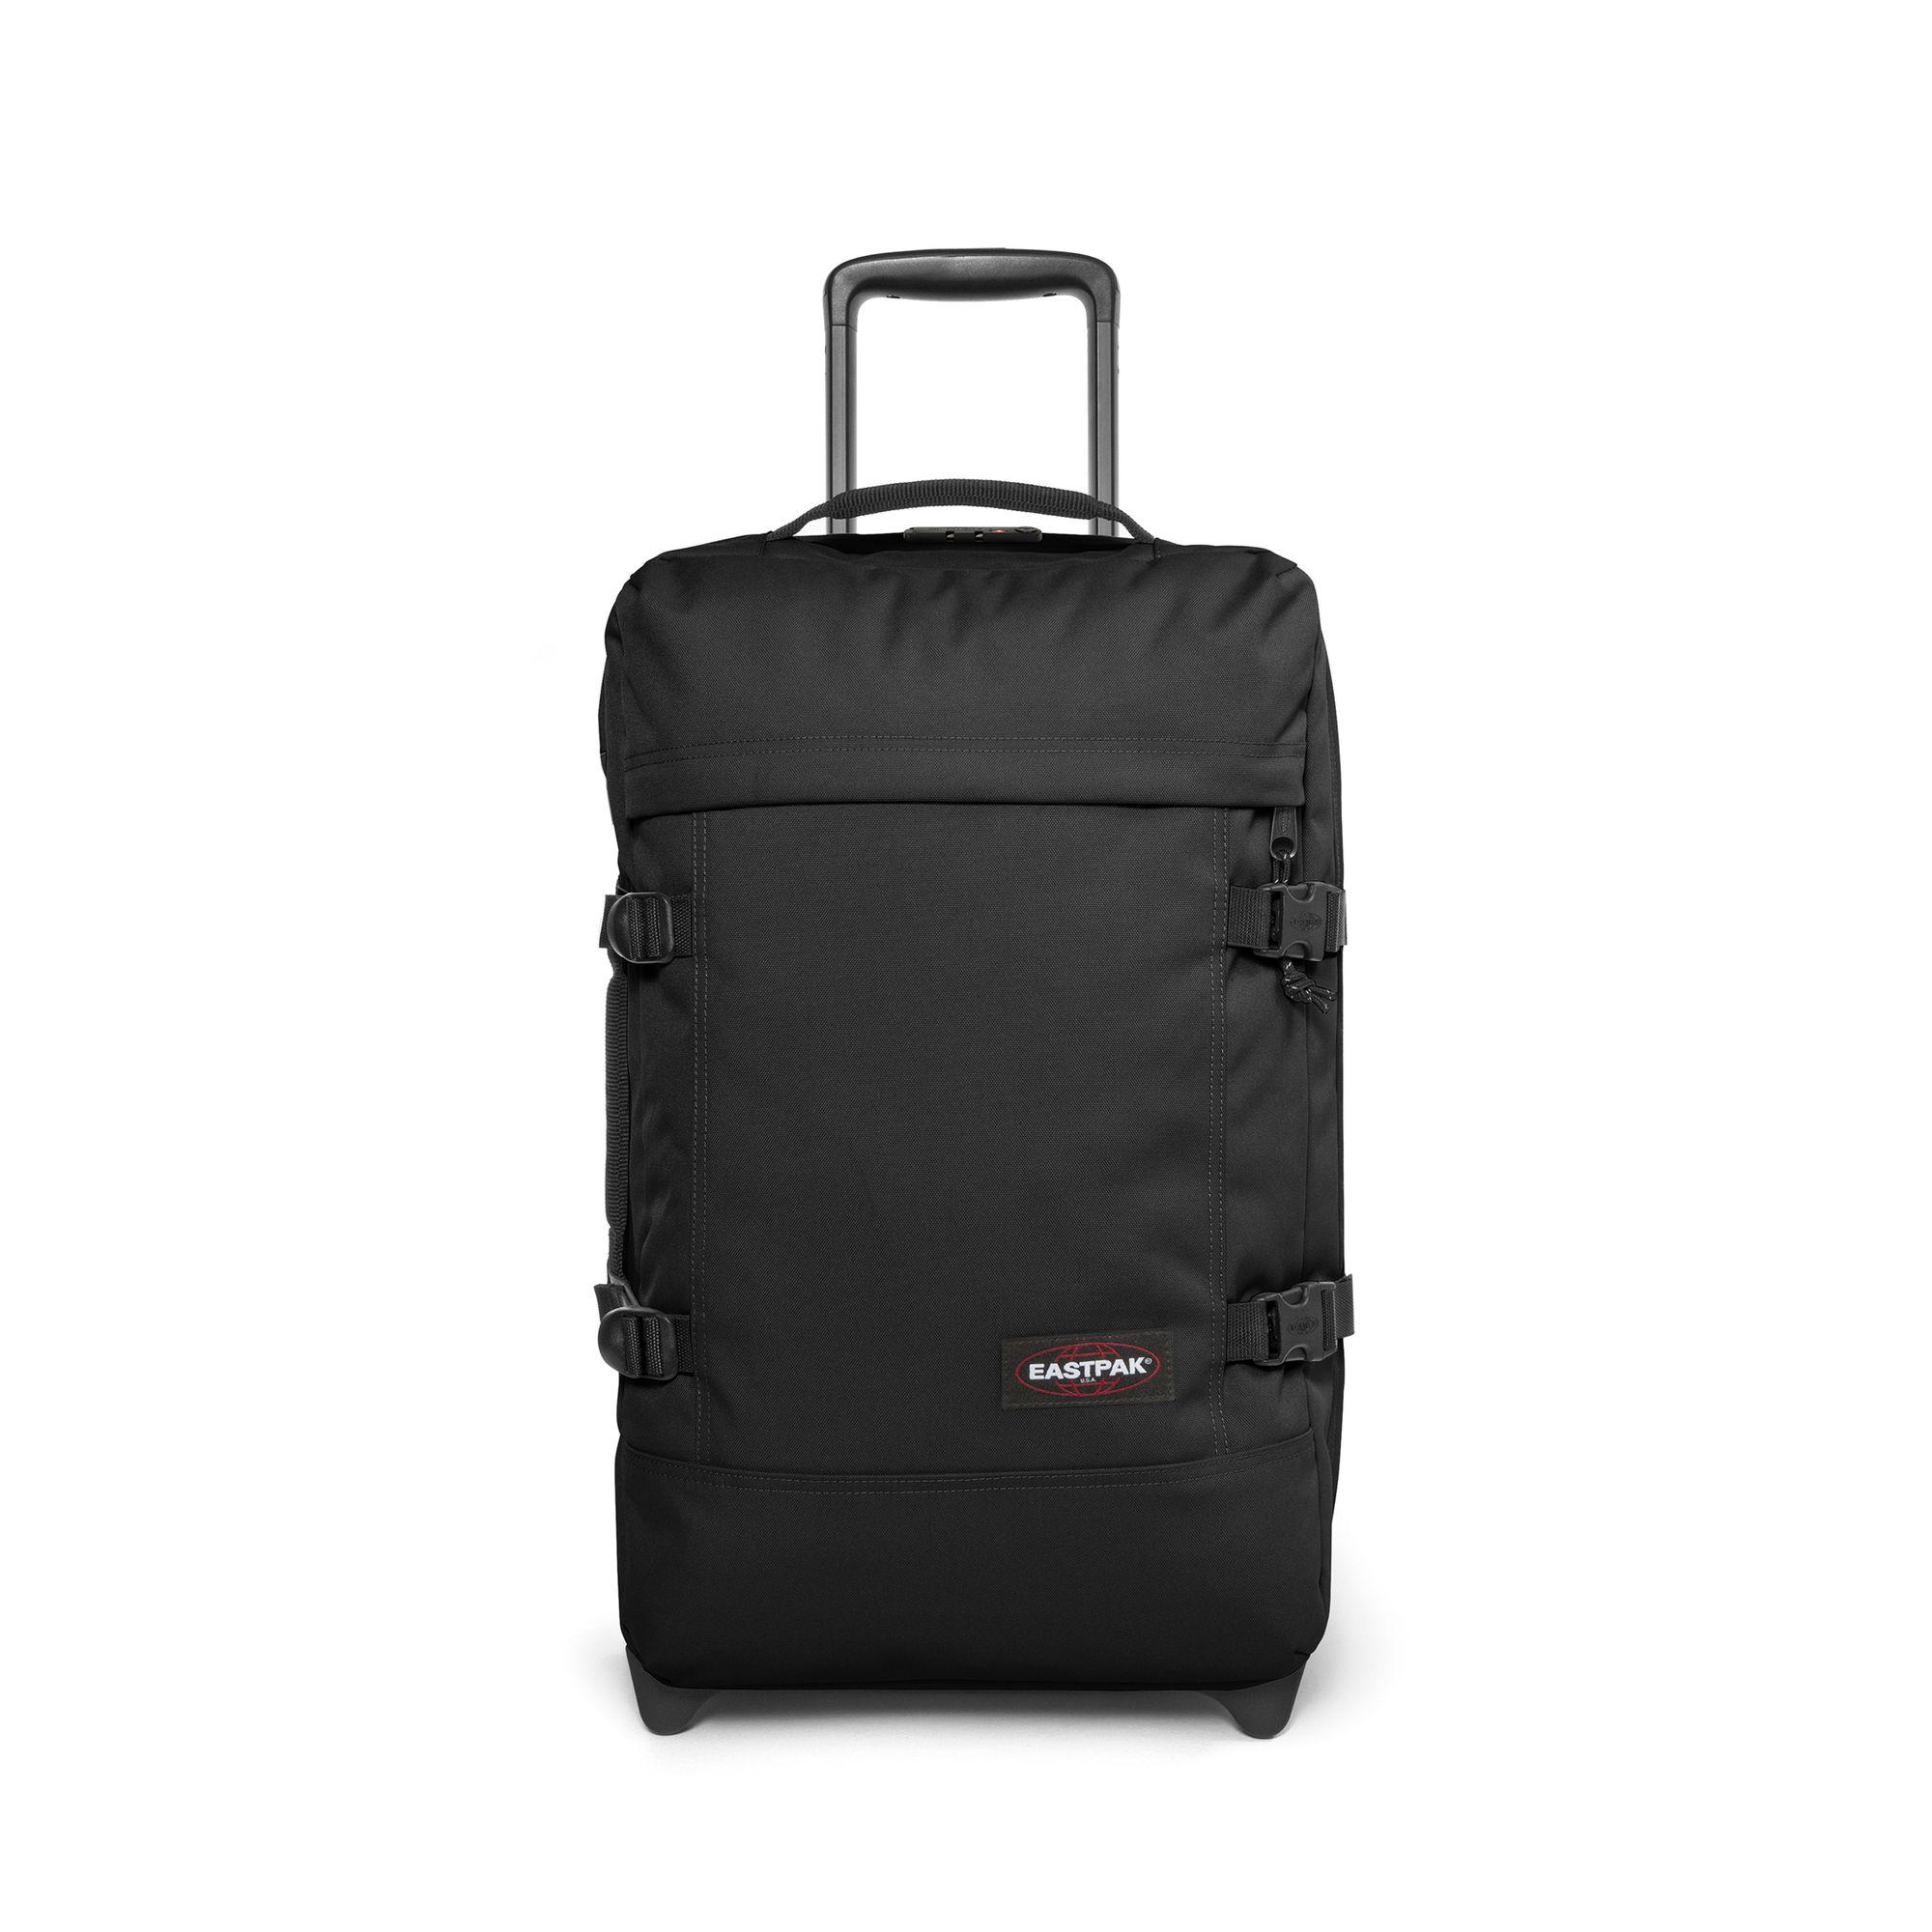 eastpak benchmark l ek28b ryggsäckar finns på PricePi.com. 09d1ecda3bc13